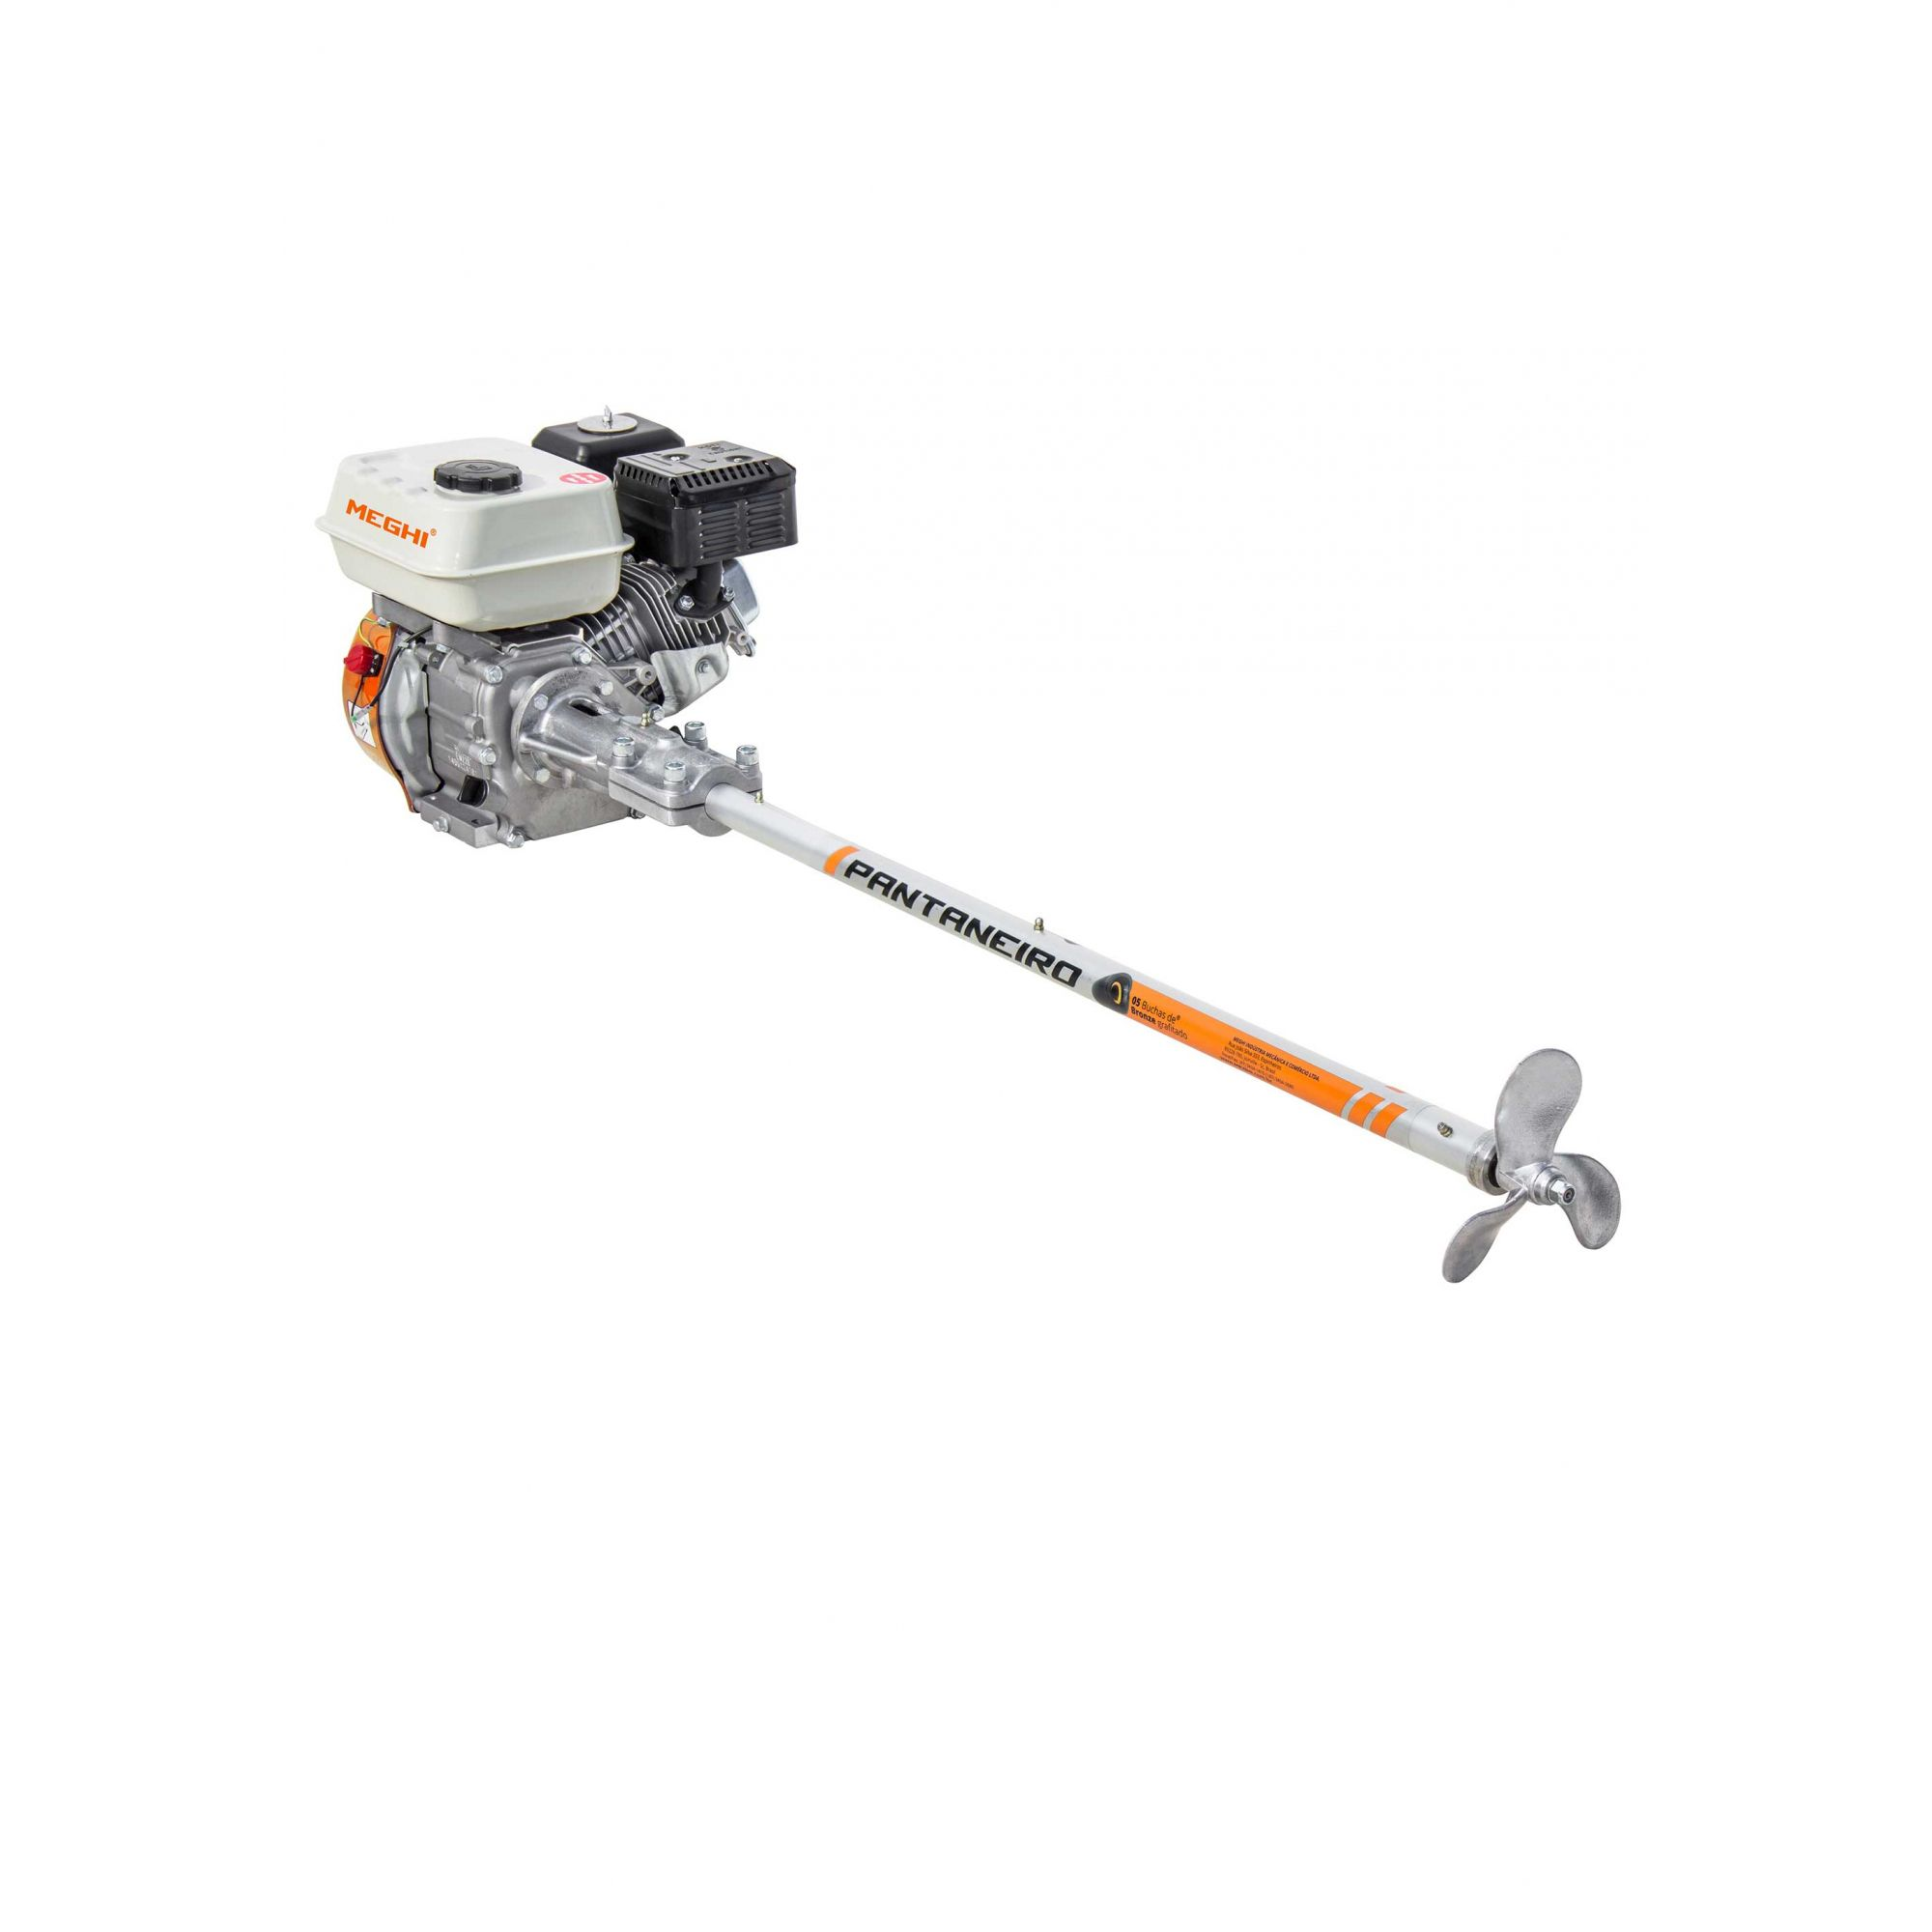 Kit Motor De Centro Barco Bote 1,20mt P/ Motor 10 Die/13 Gas